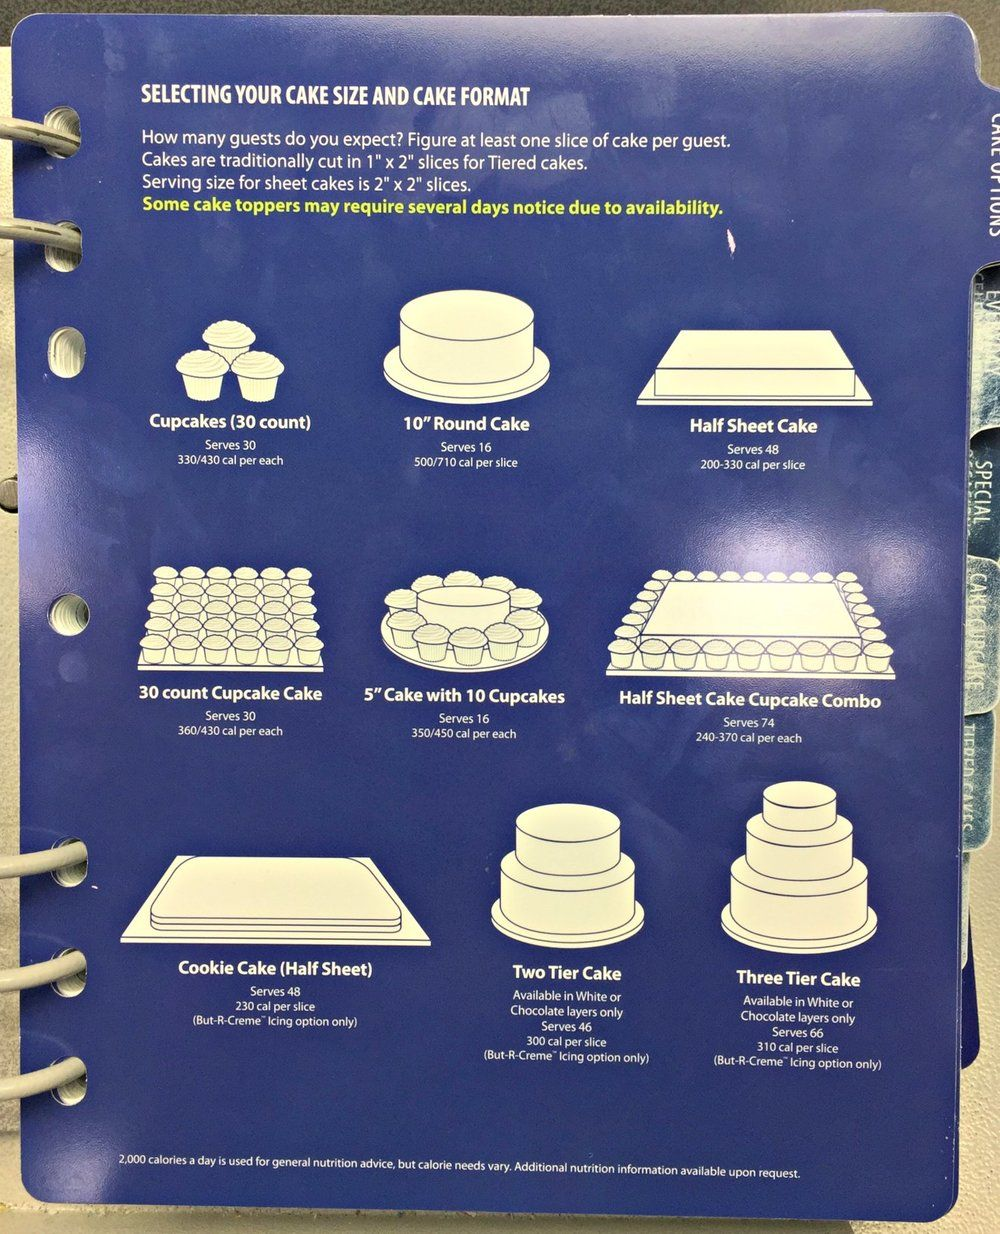 Walmart Sheet Cake Prices : walmart, sheet, prices, Sam's, Club/Walmart, Ideas, Cake,, Tiered, Cakes,, Pricing